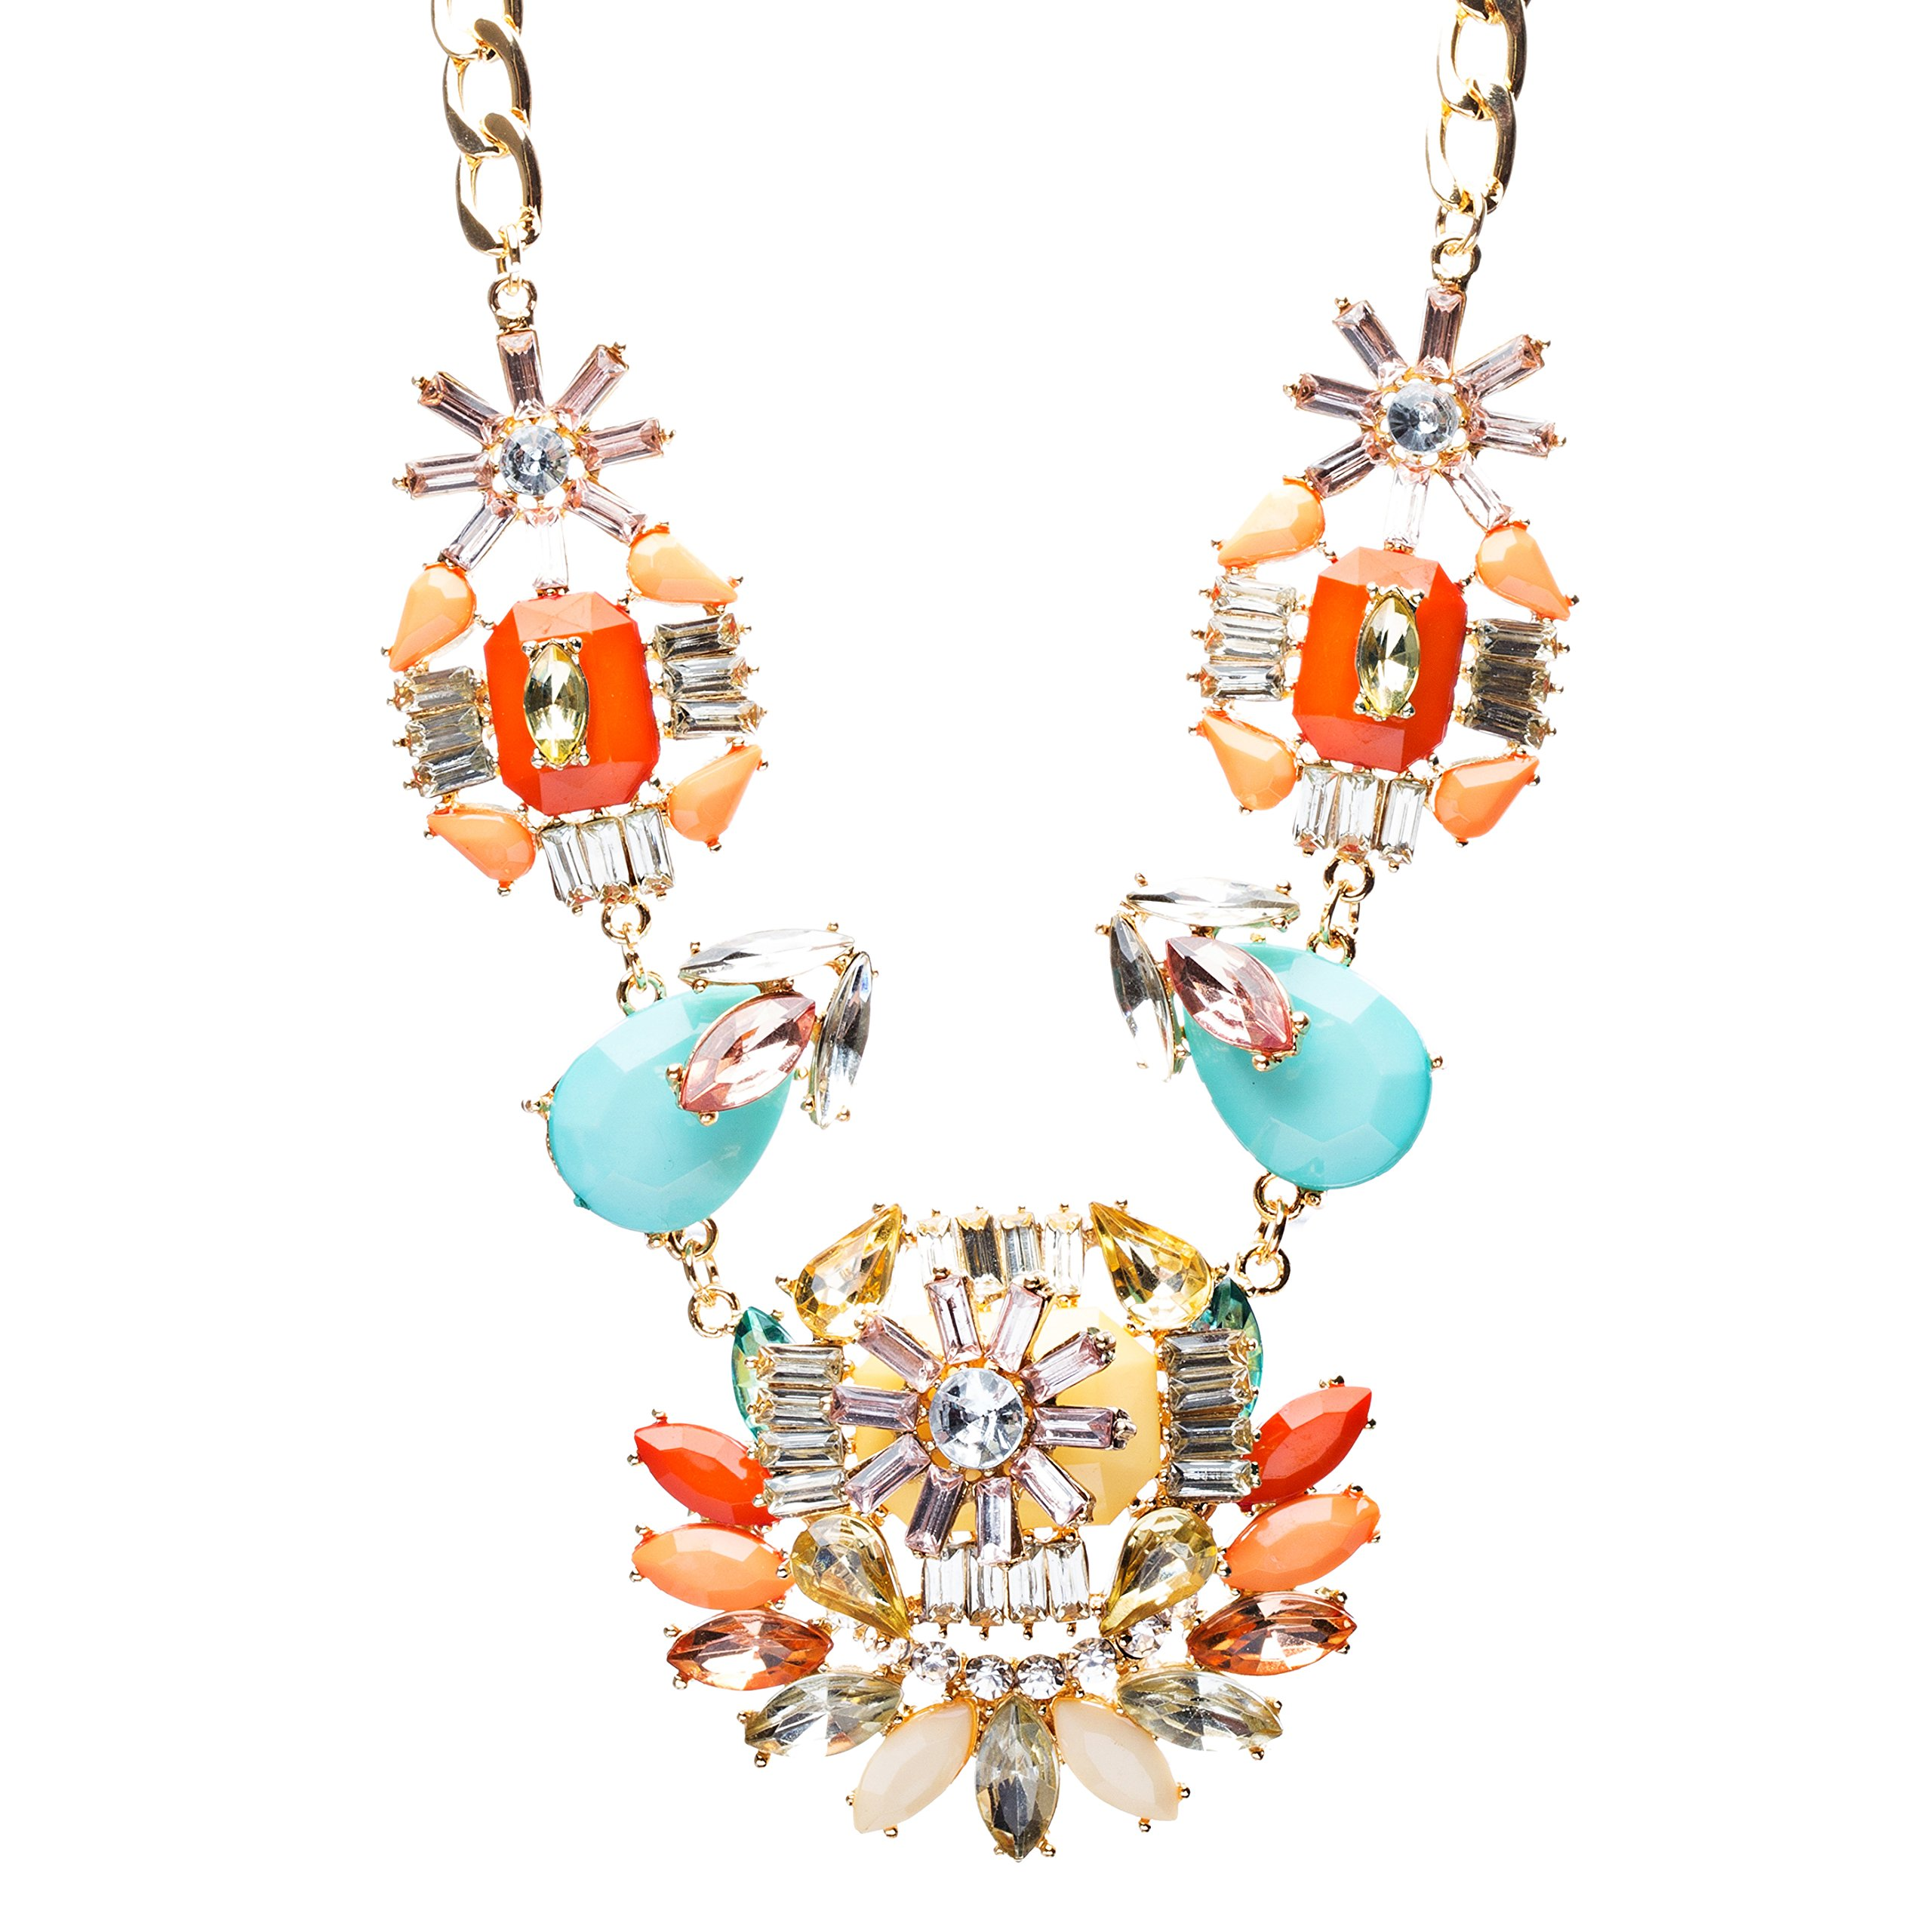 Audacious Design Crystal Rhinestone Fascinating Arrangement Necklace Set N76 MT